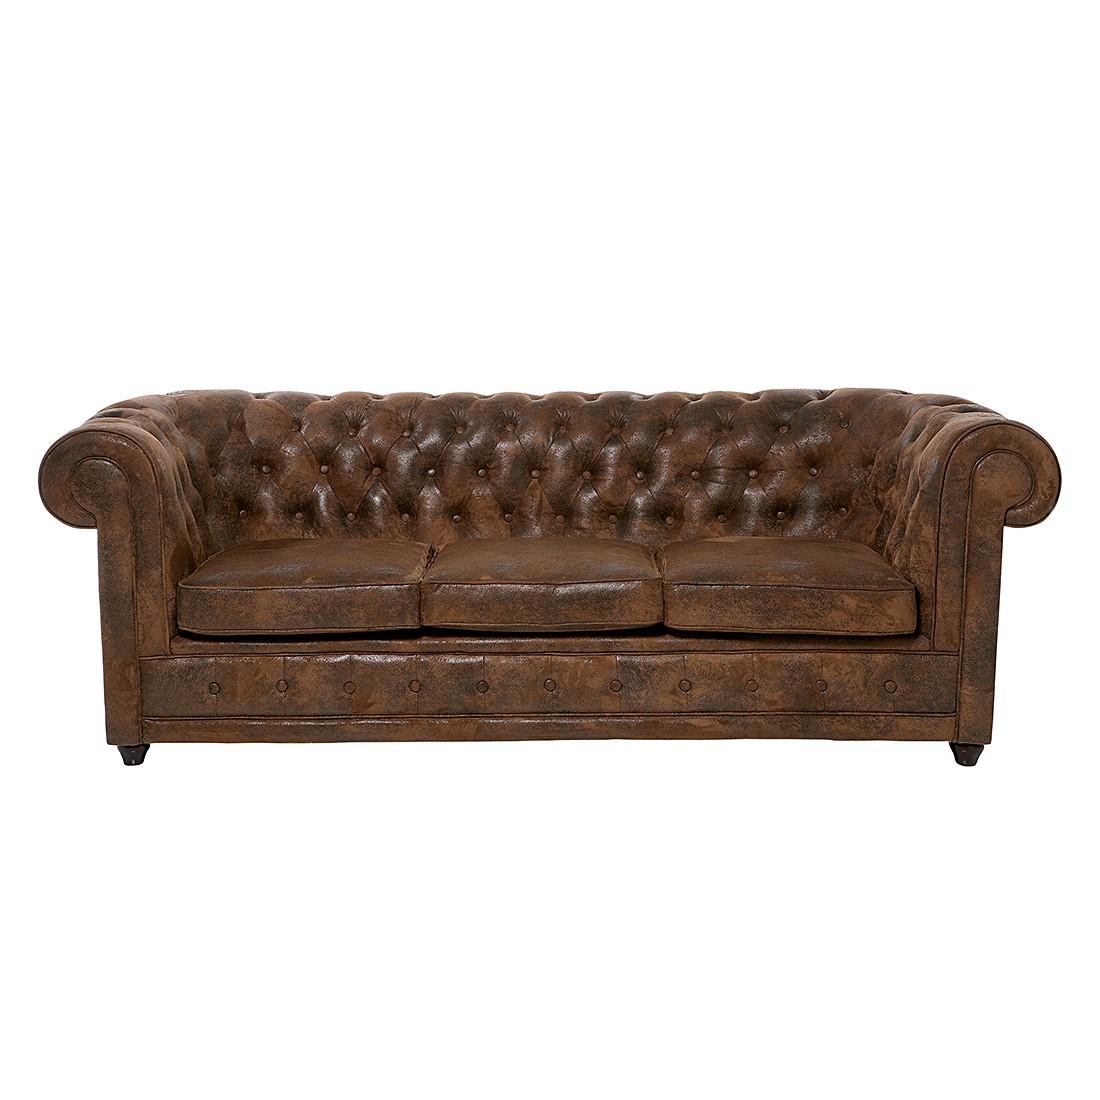 Sofa Oxford Vintage Eco (3-Sitzer) - Microfaser Braun, Kare Design